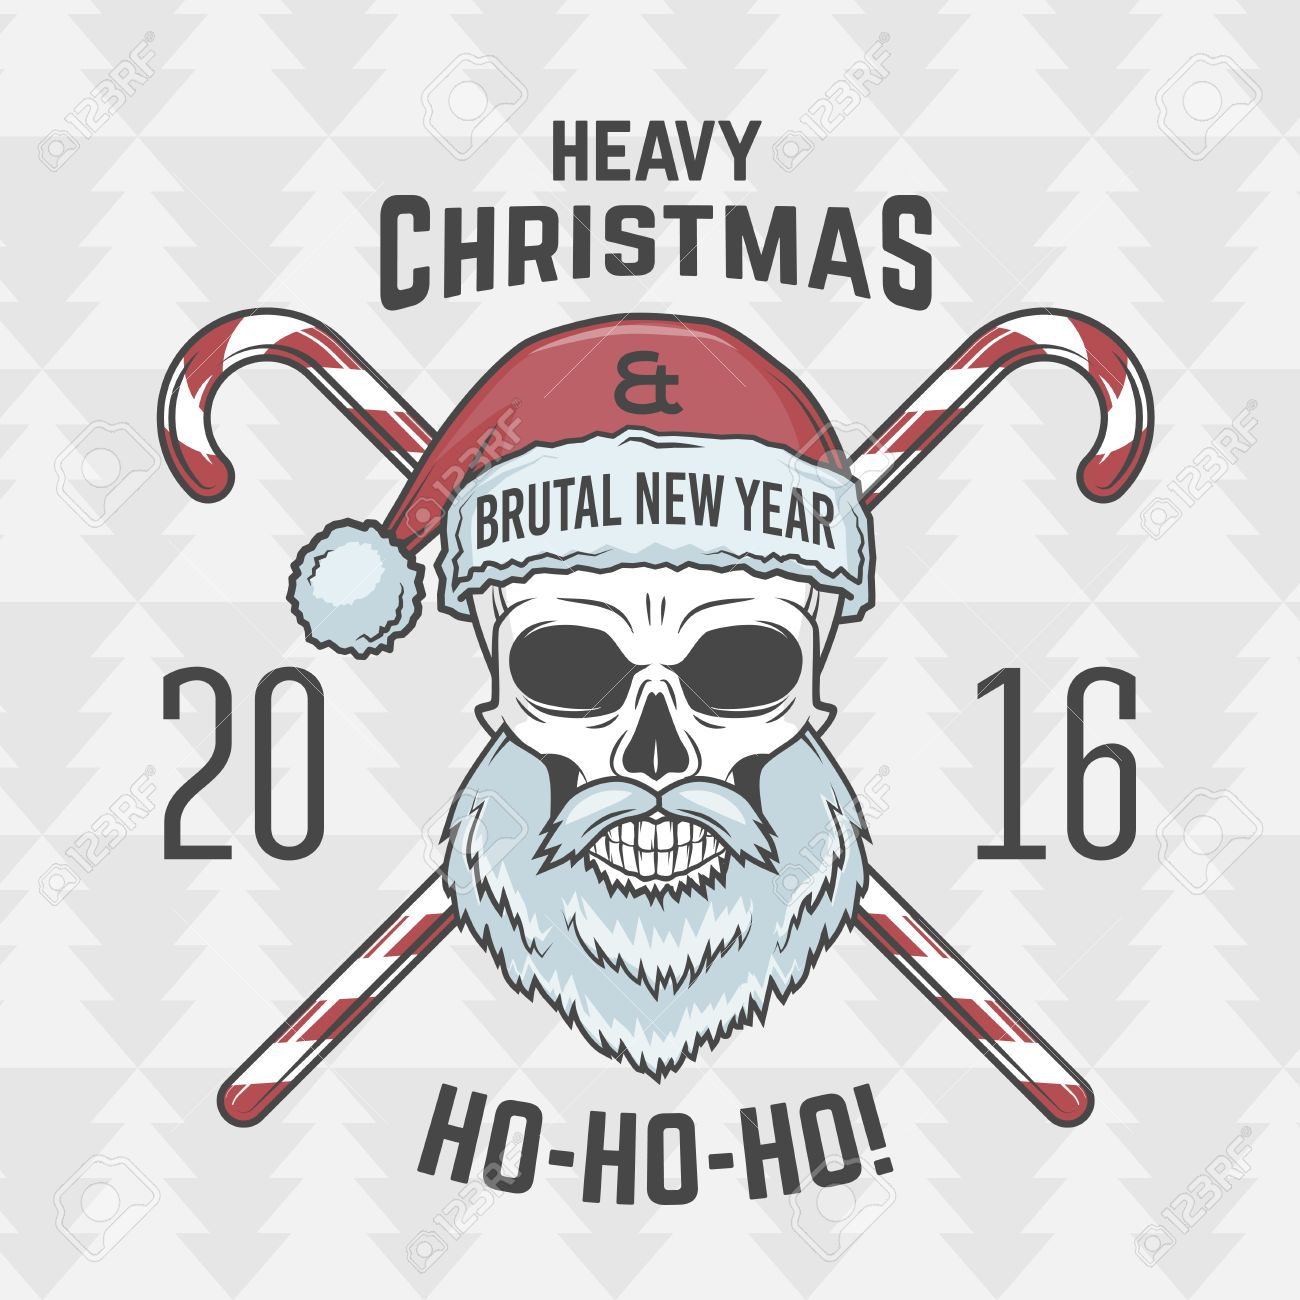 Heavy Metal Christmas.Bad Santa Claus Biker With Candies Print Design Heavy Metal